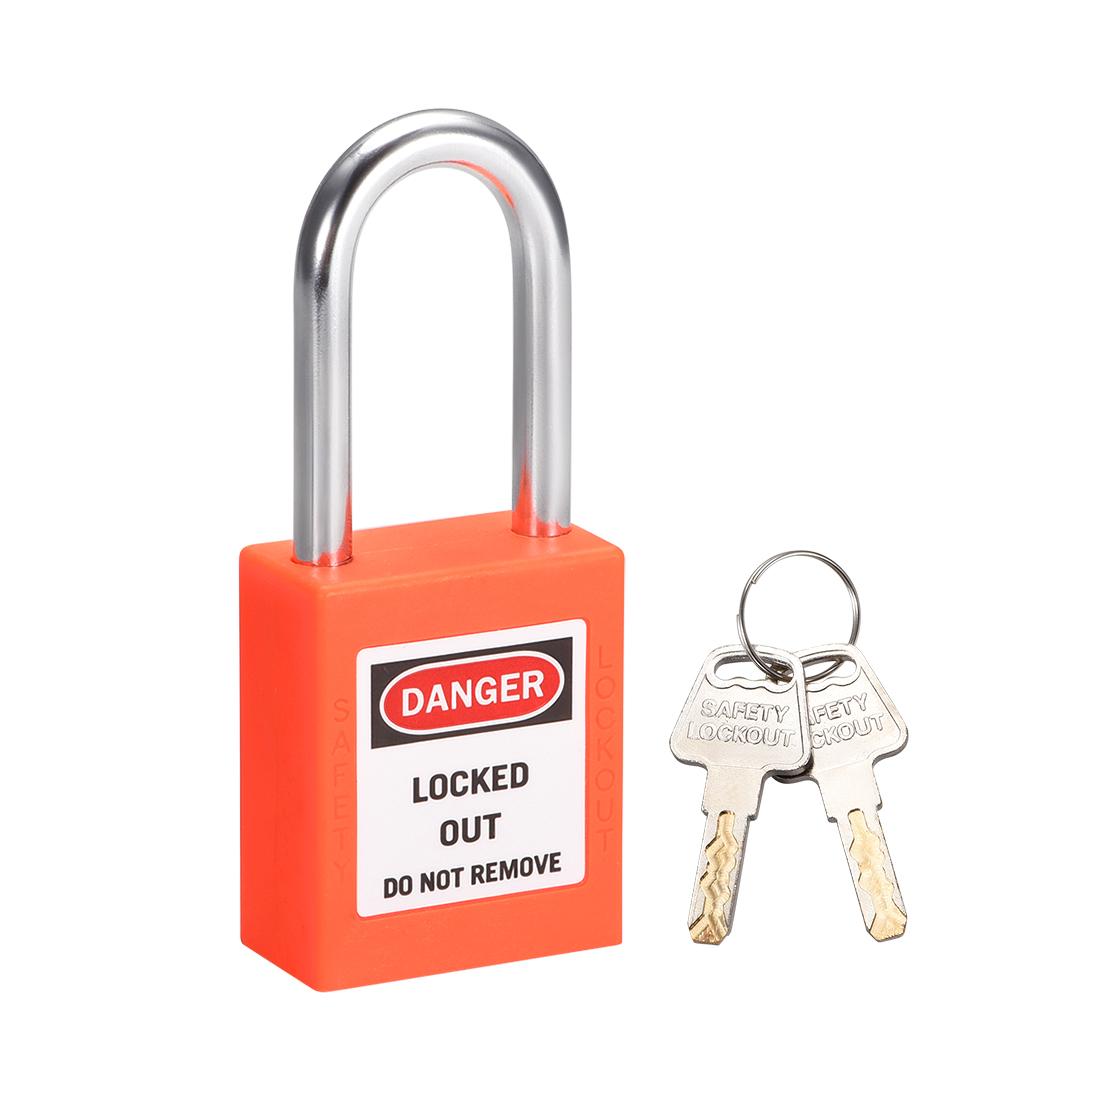 Lockout Tagout Locks 1-1/2 Inch Shackle Key Different Safety Padlock Lock Orange